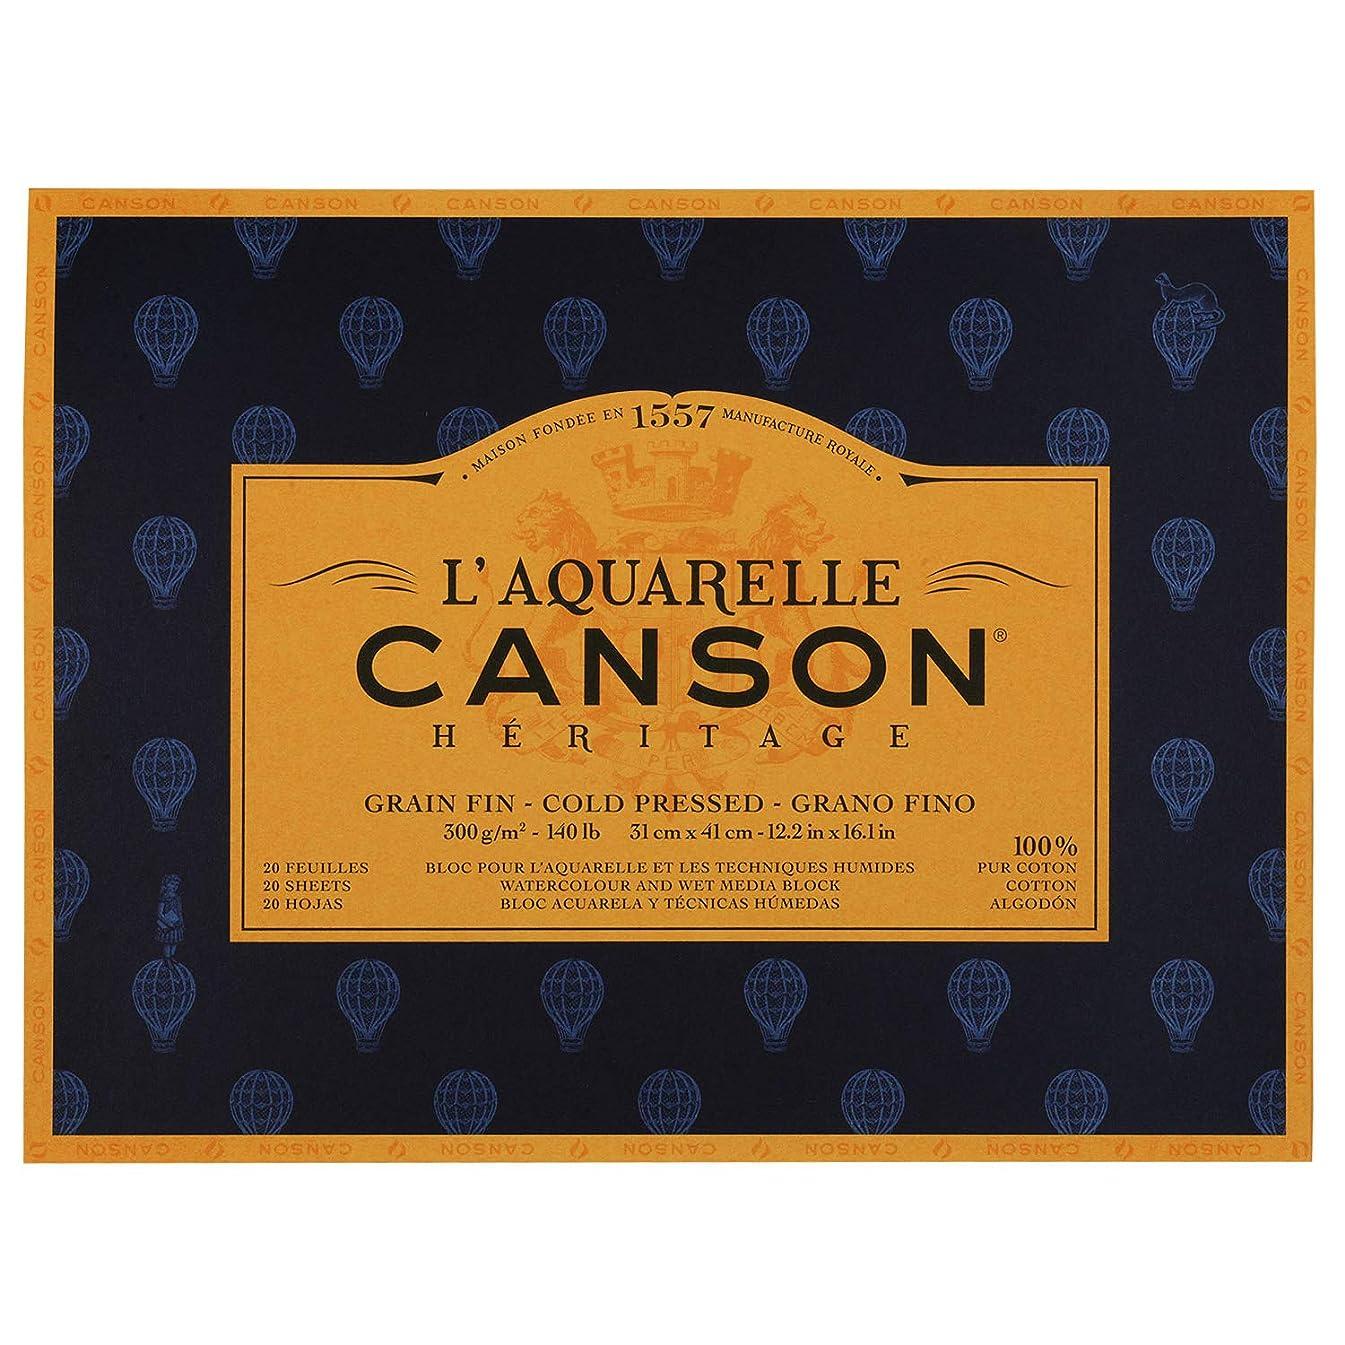 L'Aquarelle Canson Heritage Watercolor Paper 140lb Cold Pressed 20 Sheet Block 12X16